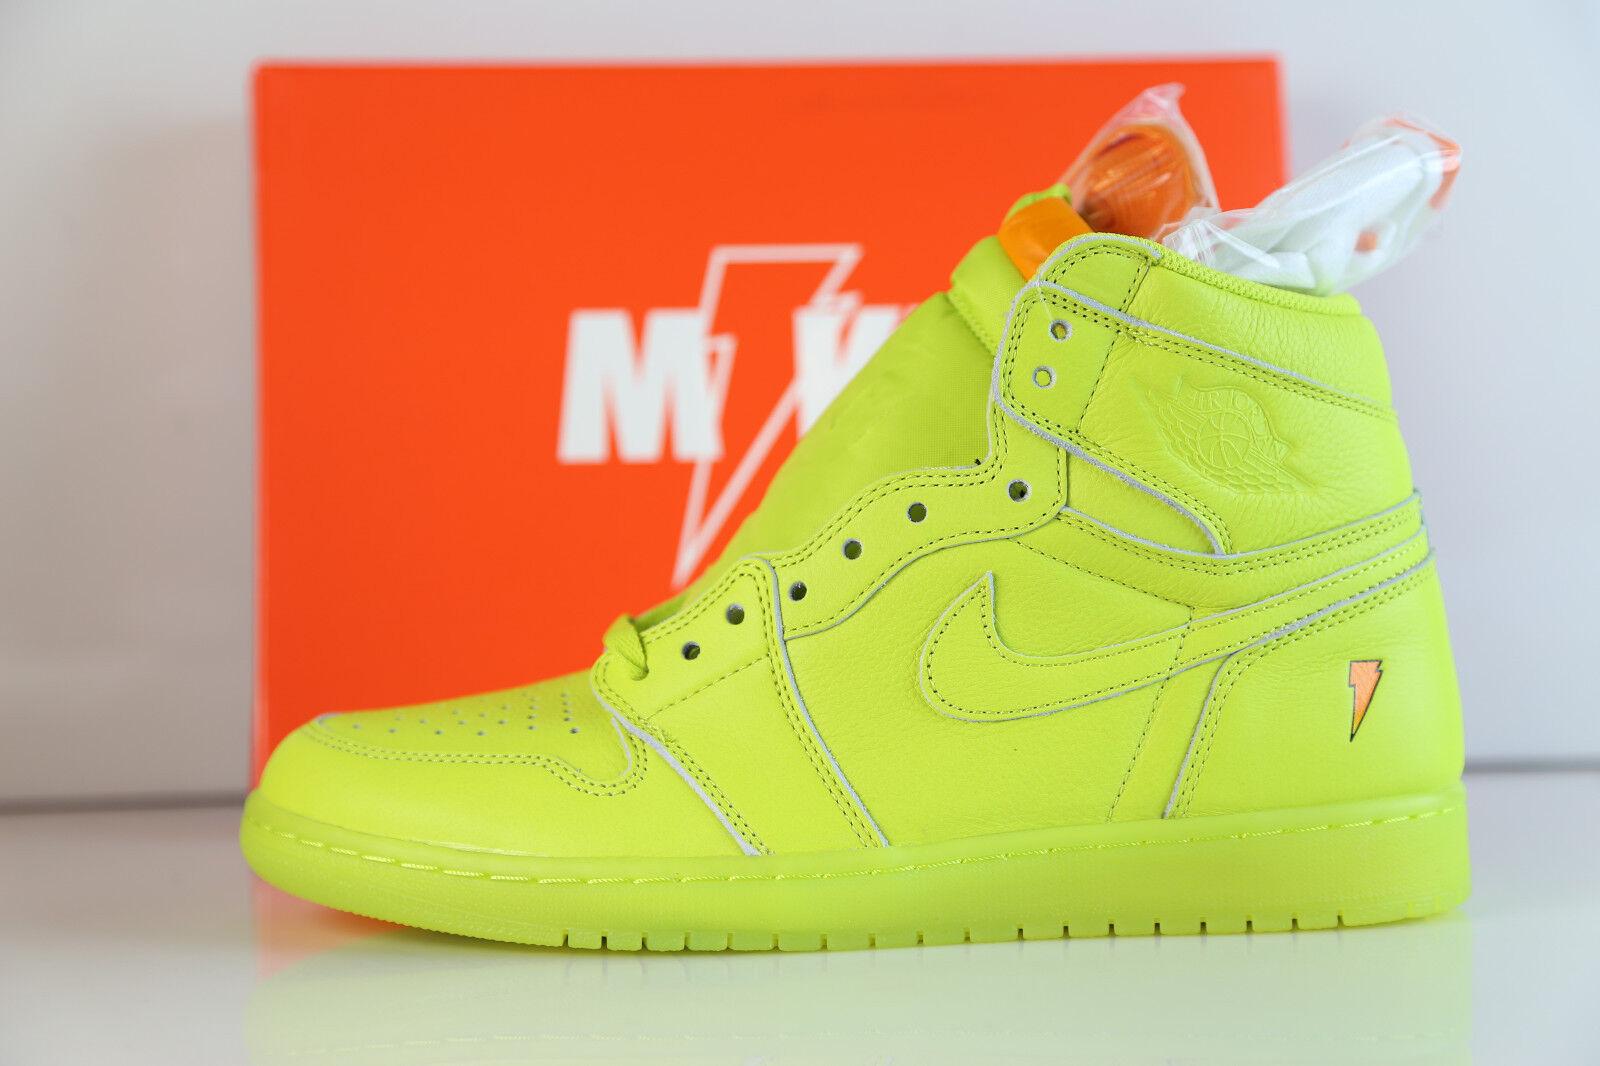 Nike Air Jordan Retro 1 1 1 High OG G8RD Gatorade Cyber AJ5997-345 8-16 lime 6 3 1 6dd83e